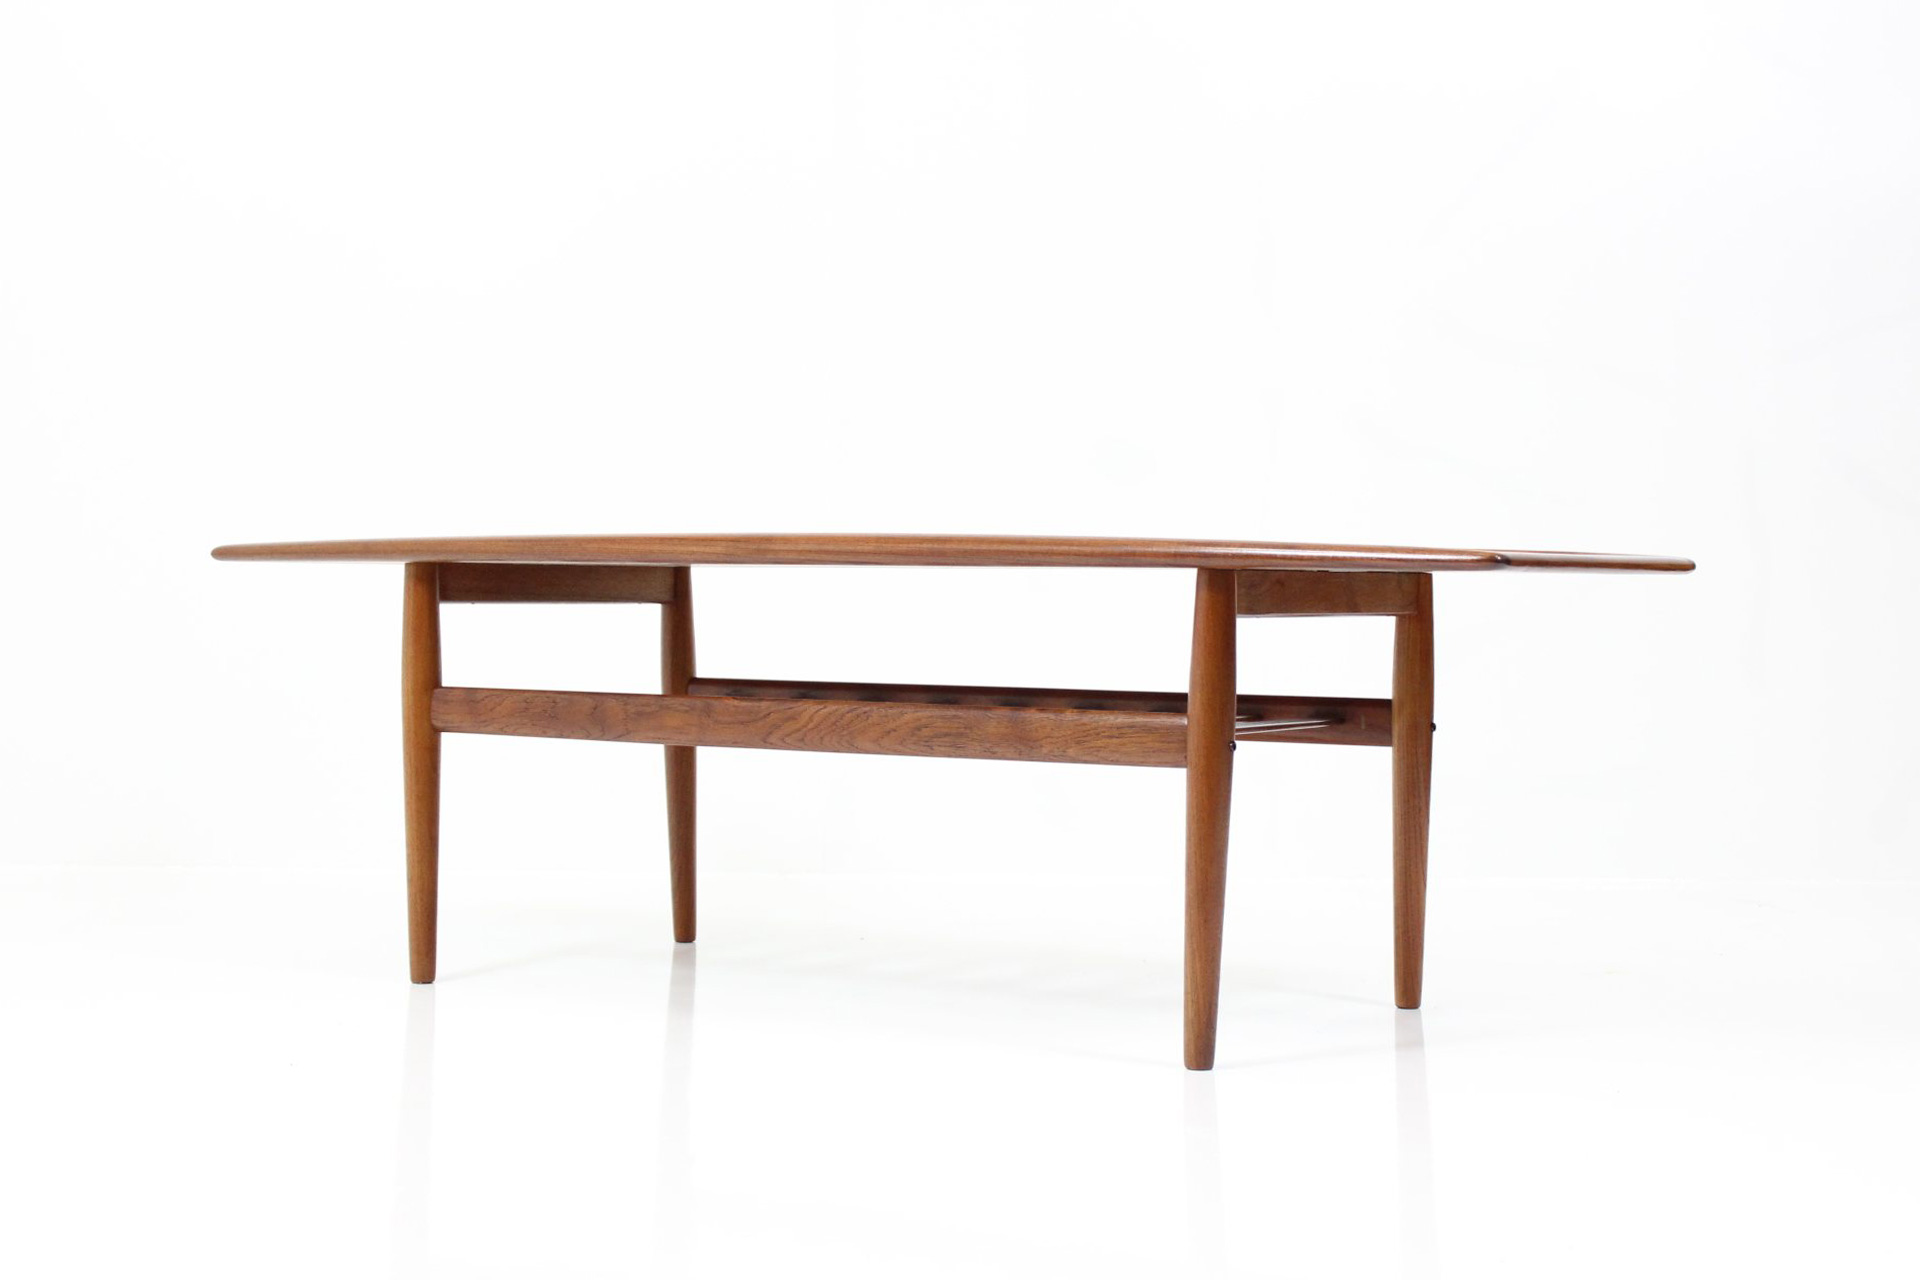 Coffee Table by Grete Jalk for Glostrup M¸belfabrik DAVINT Design